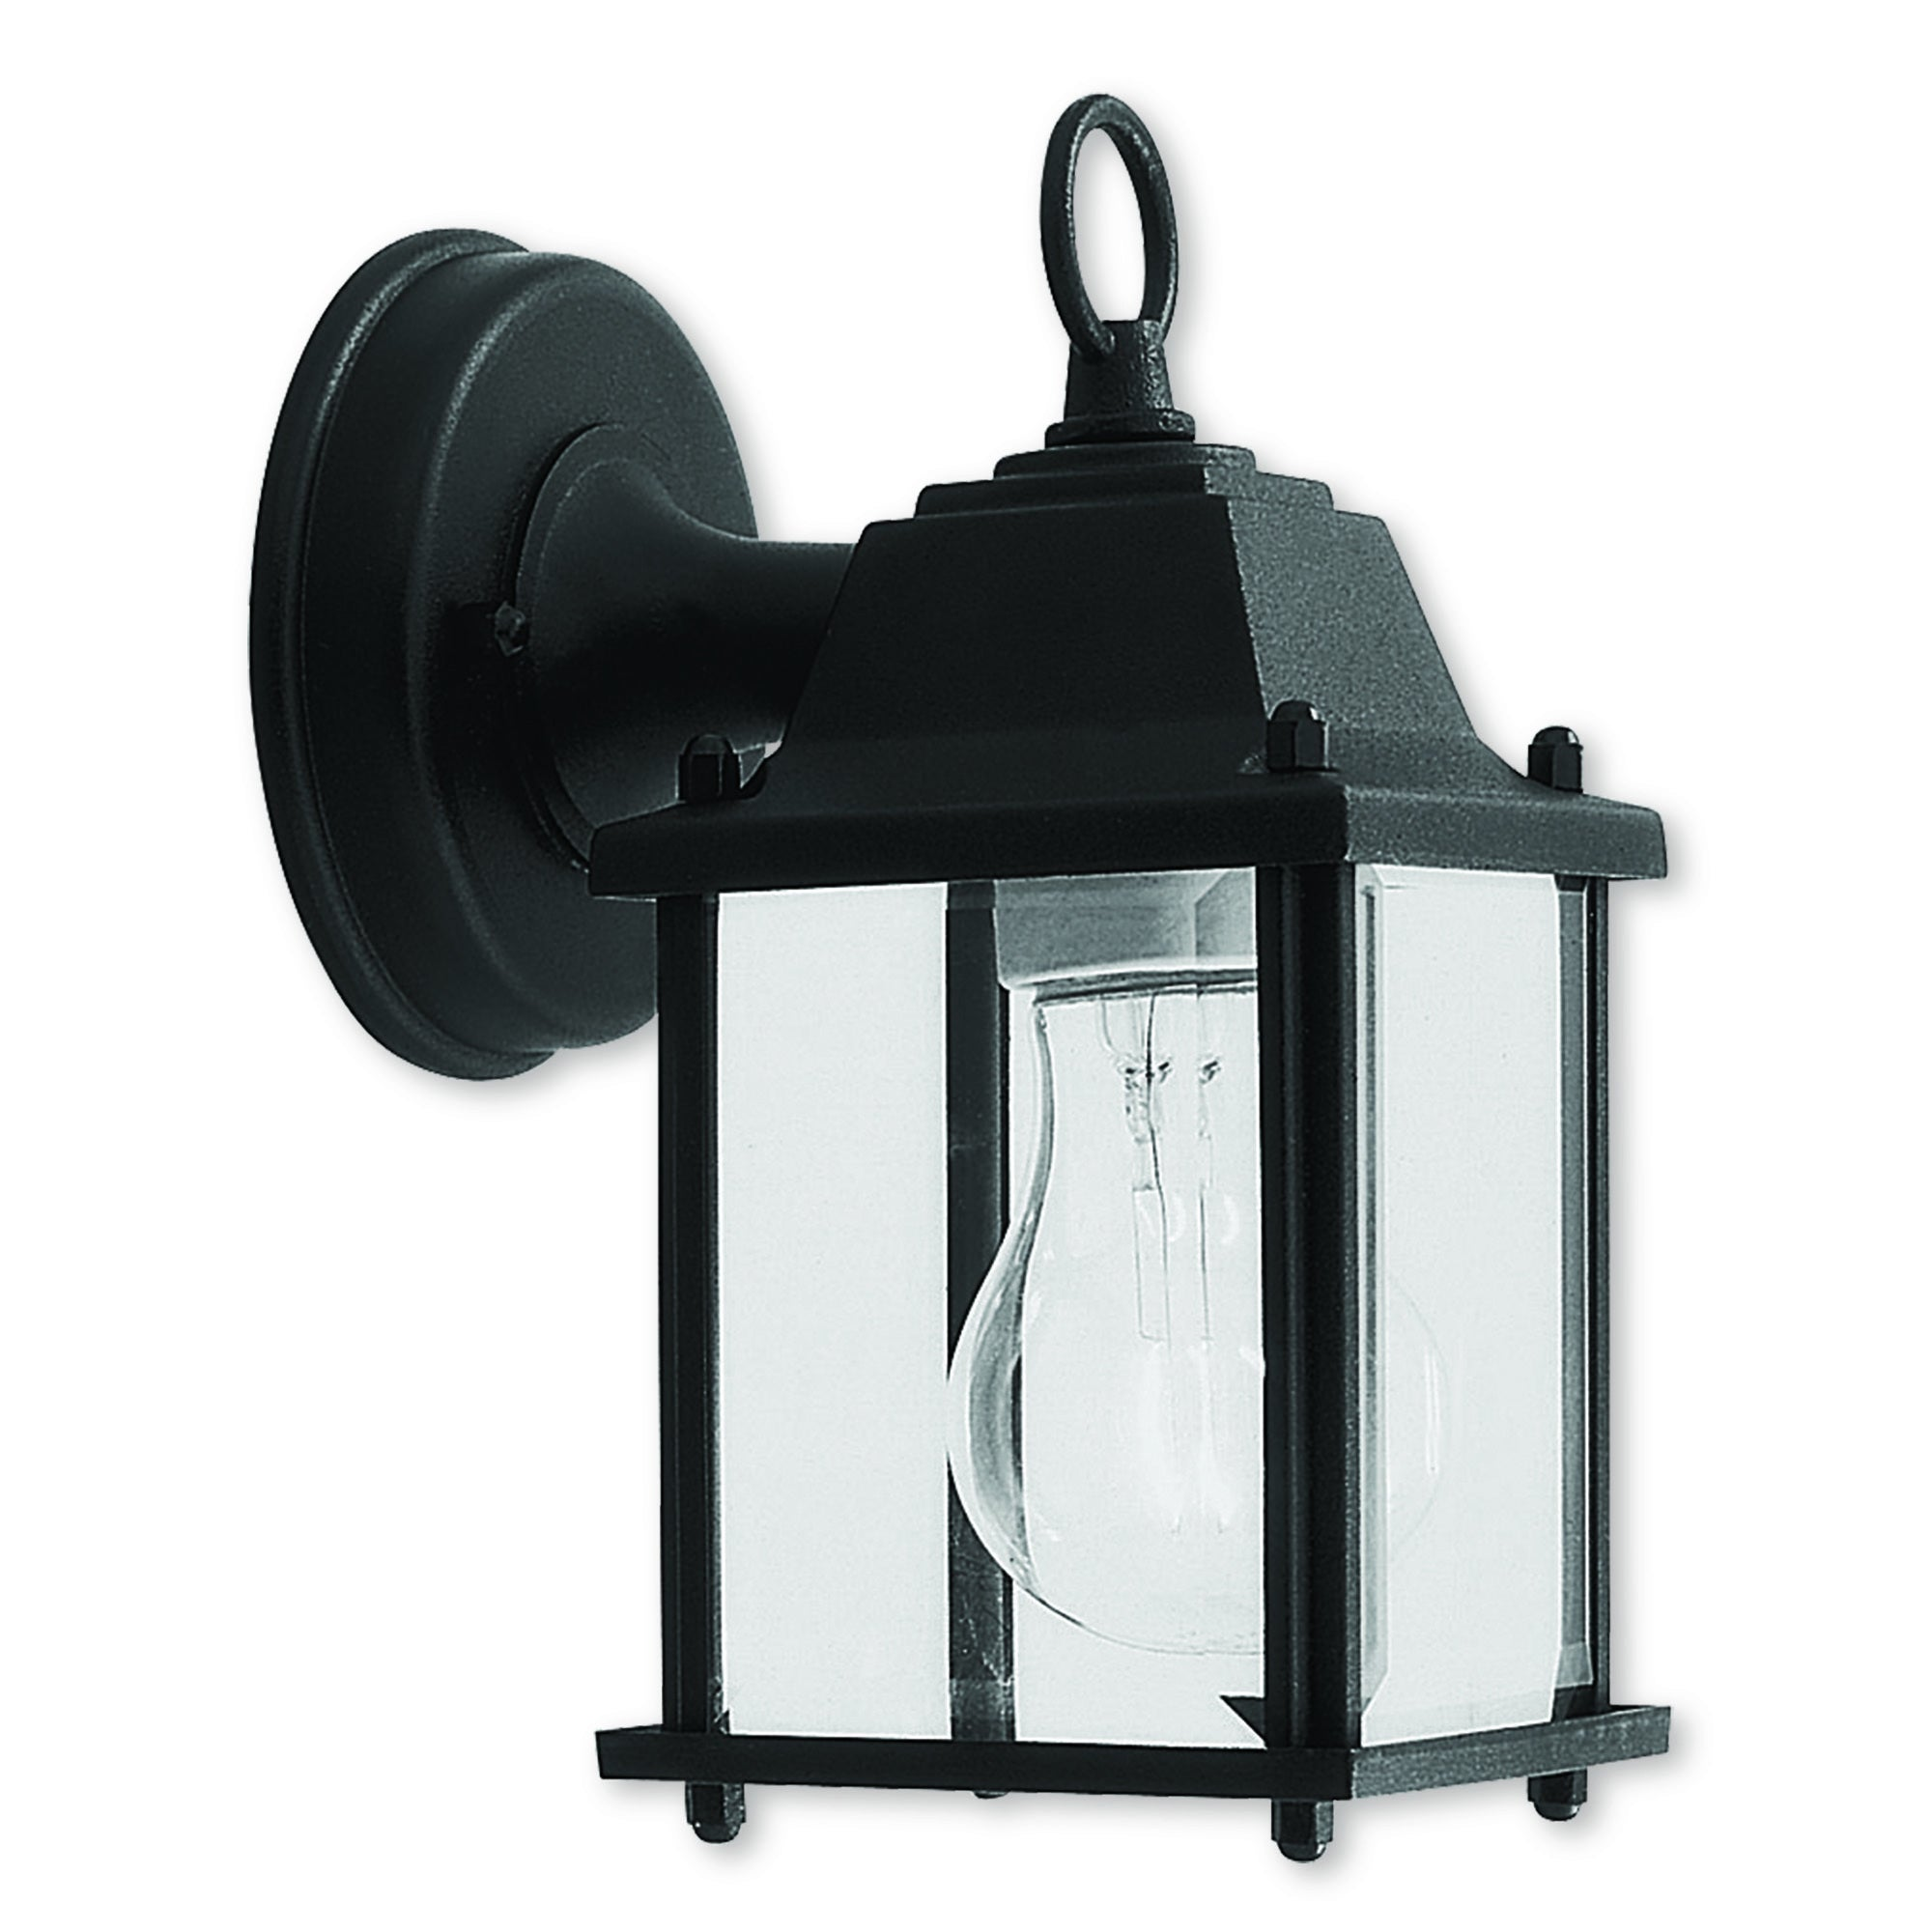 Livex Lighting Outdoor Basics Black Aluminum 1-light Wall Lantern (Black)